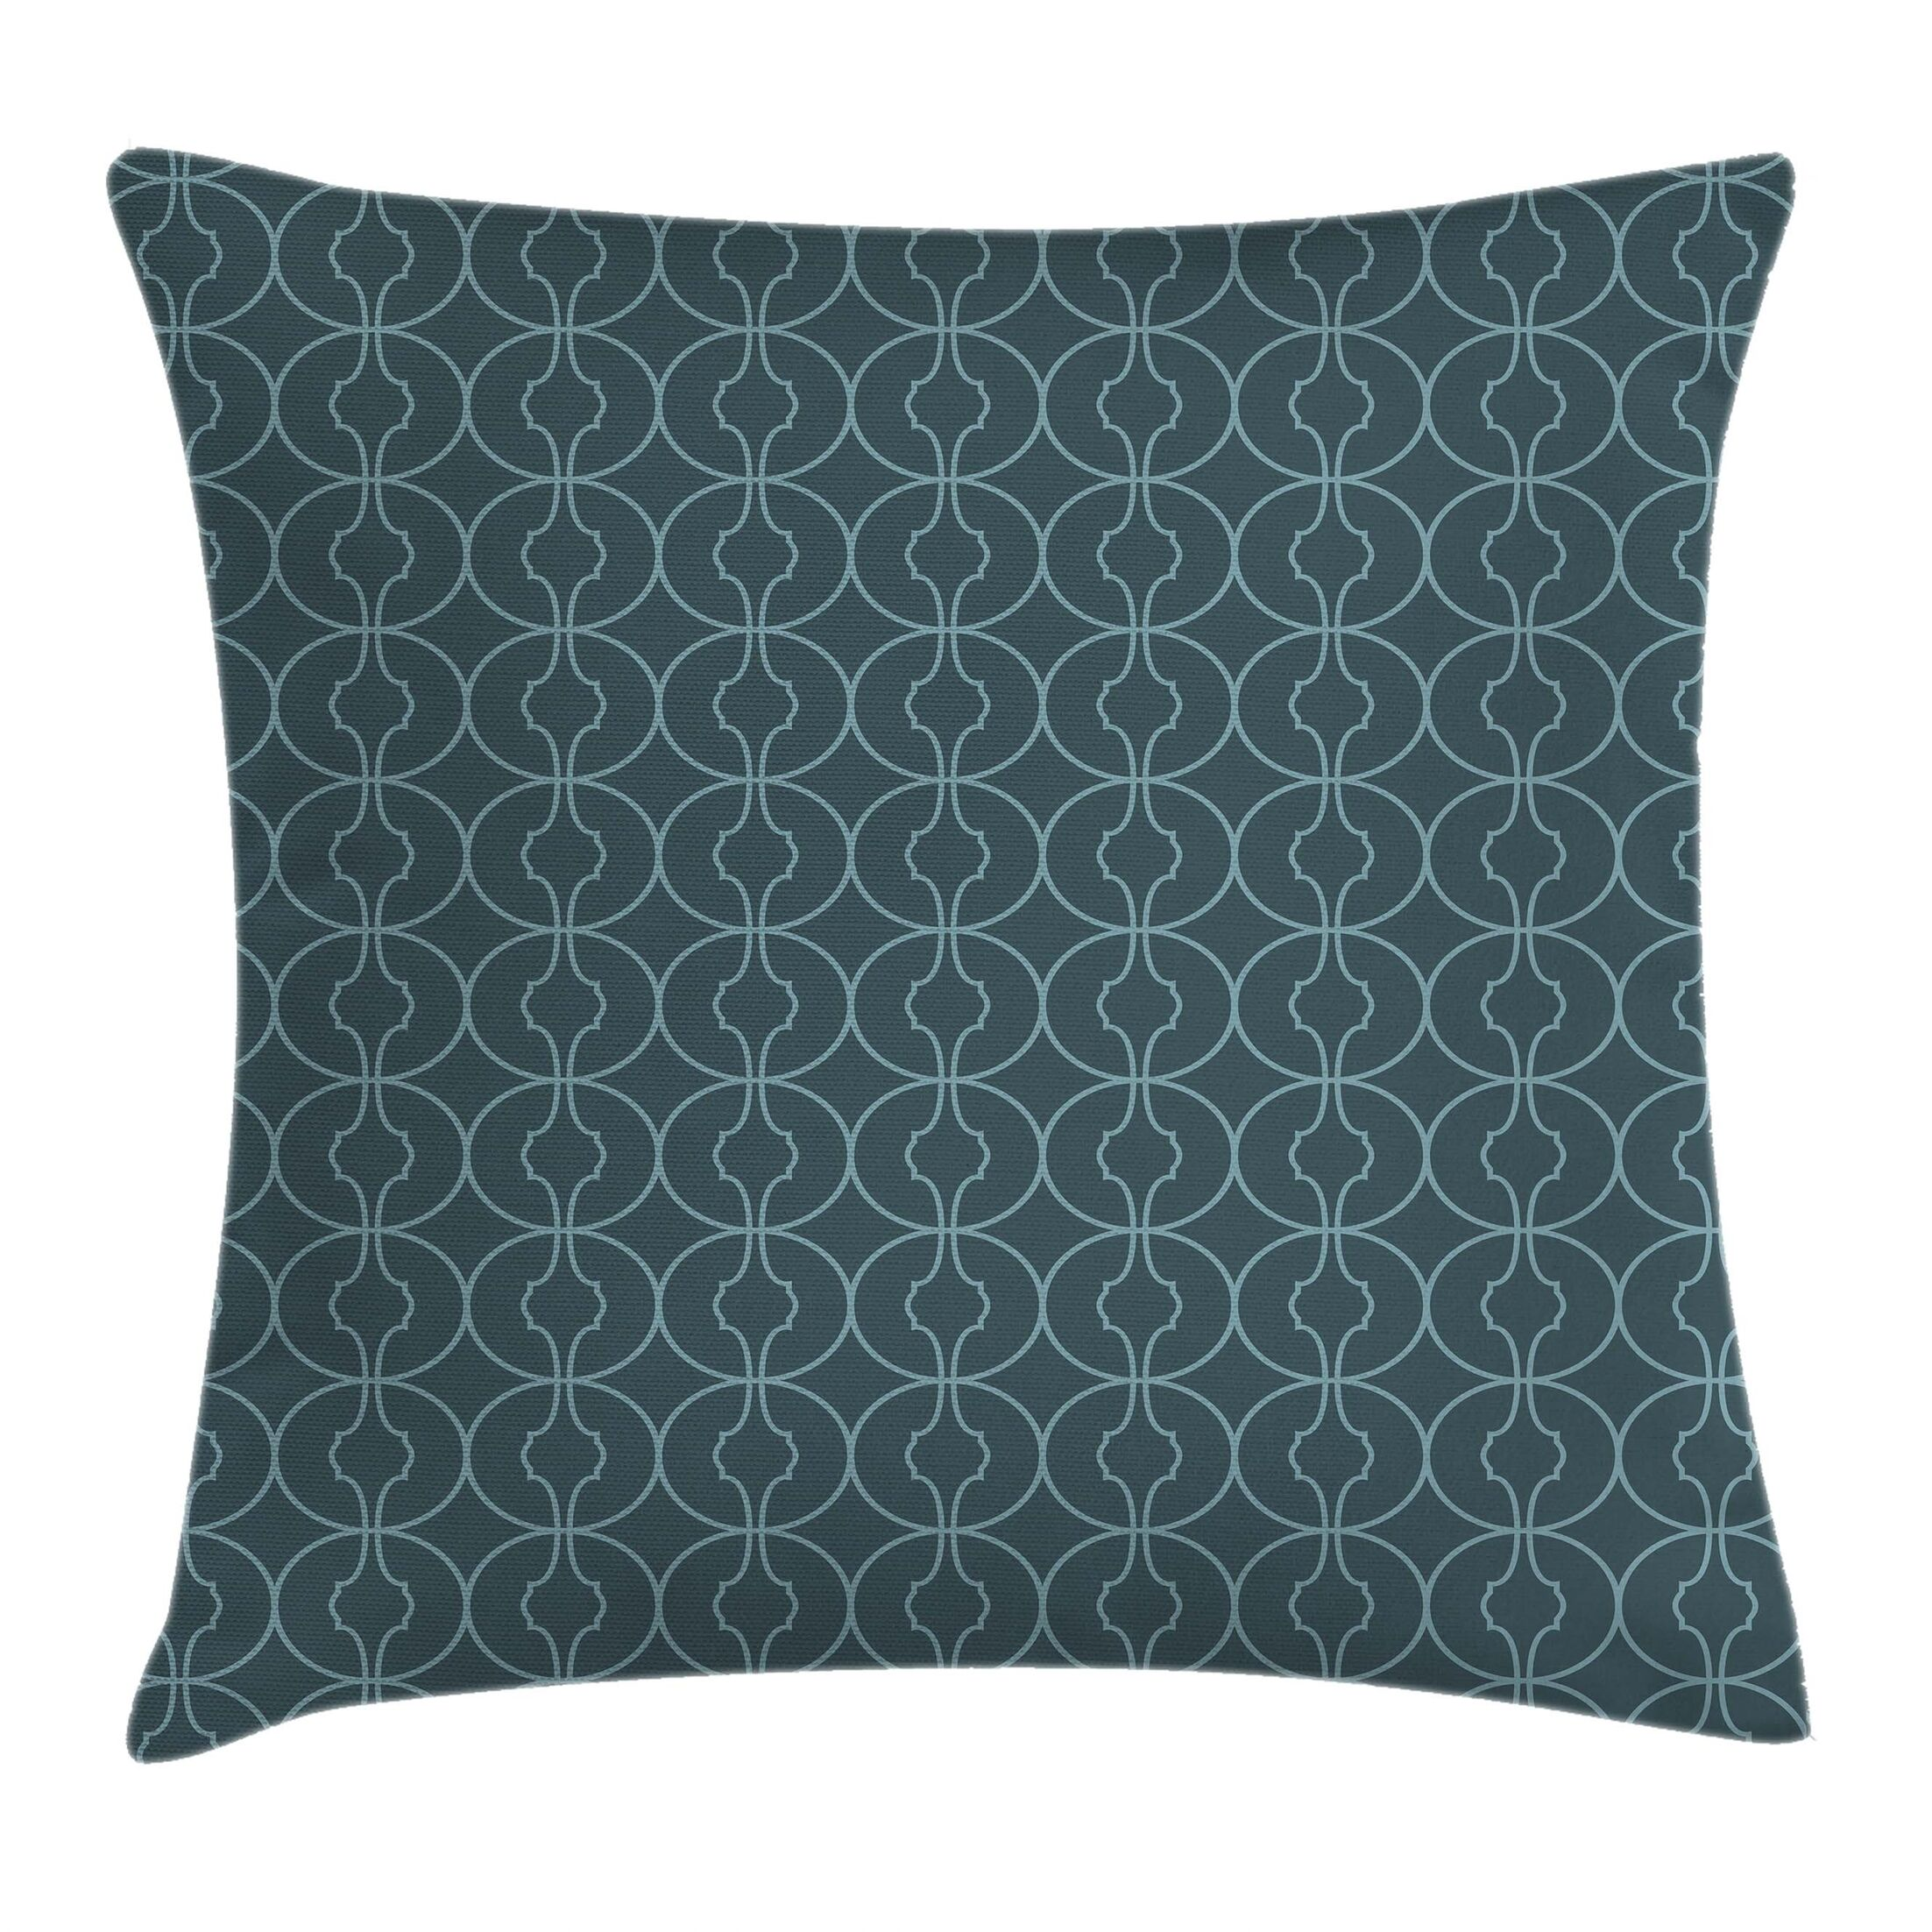 Moroccan Orient Circles Corners Square Pillow Cover Size: 16